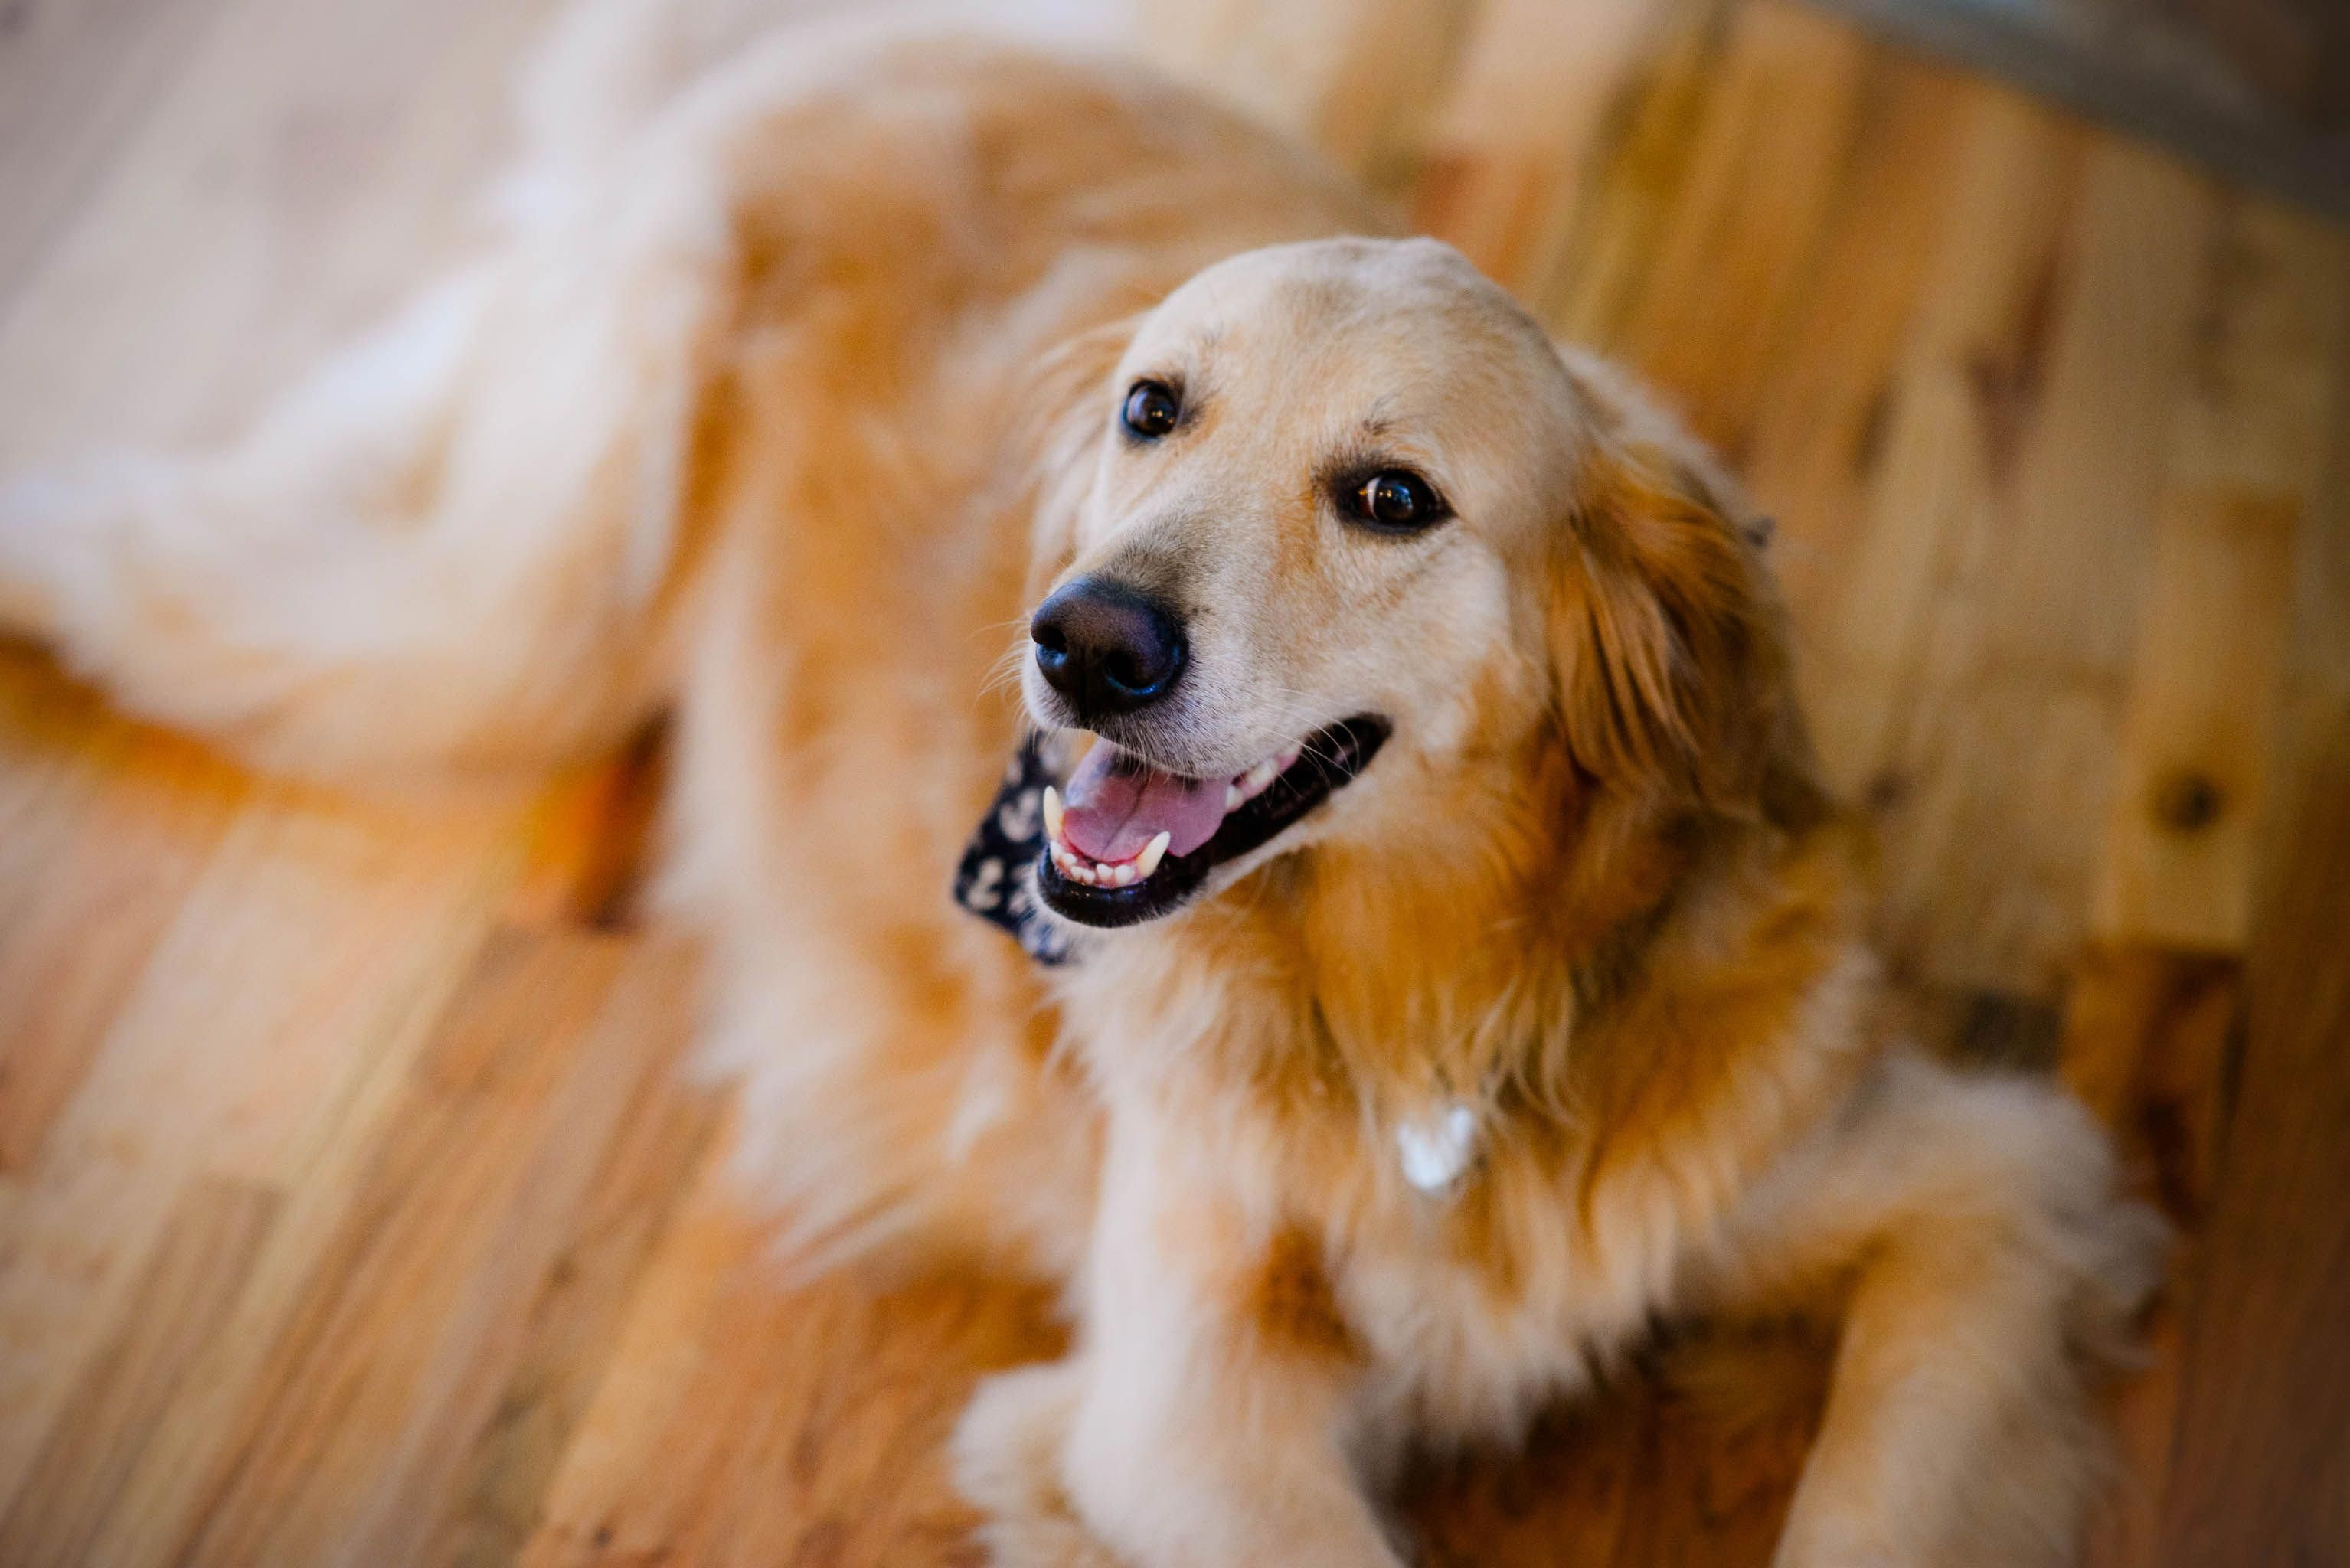 Dog Kennel Under Counter Dogkennelundercounter Golden Retriever